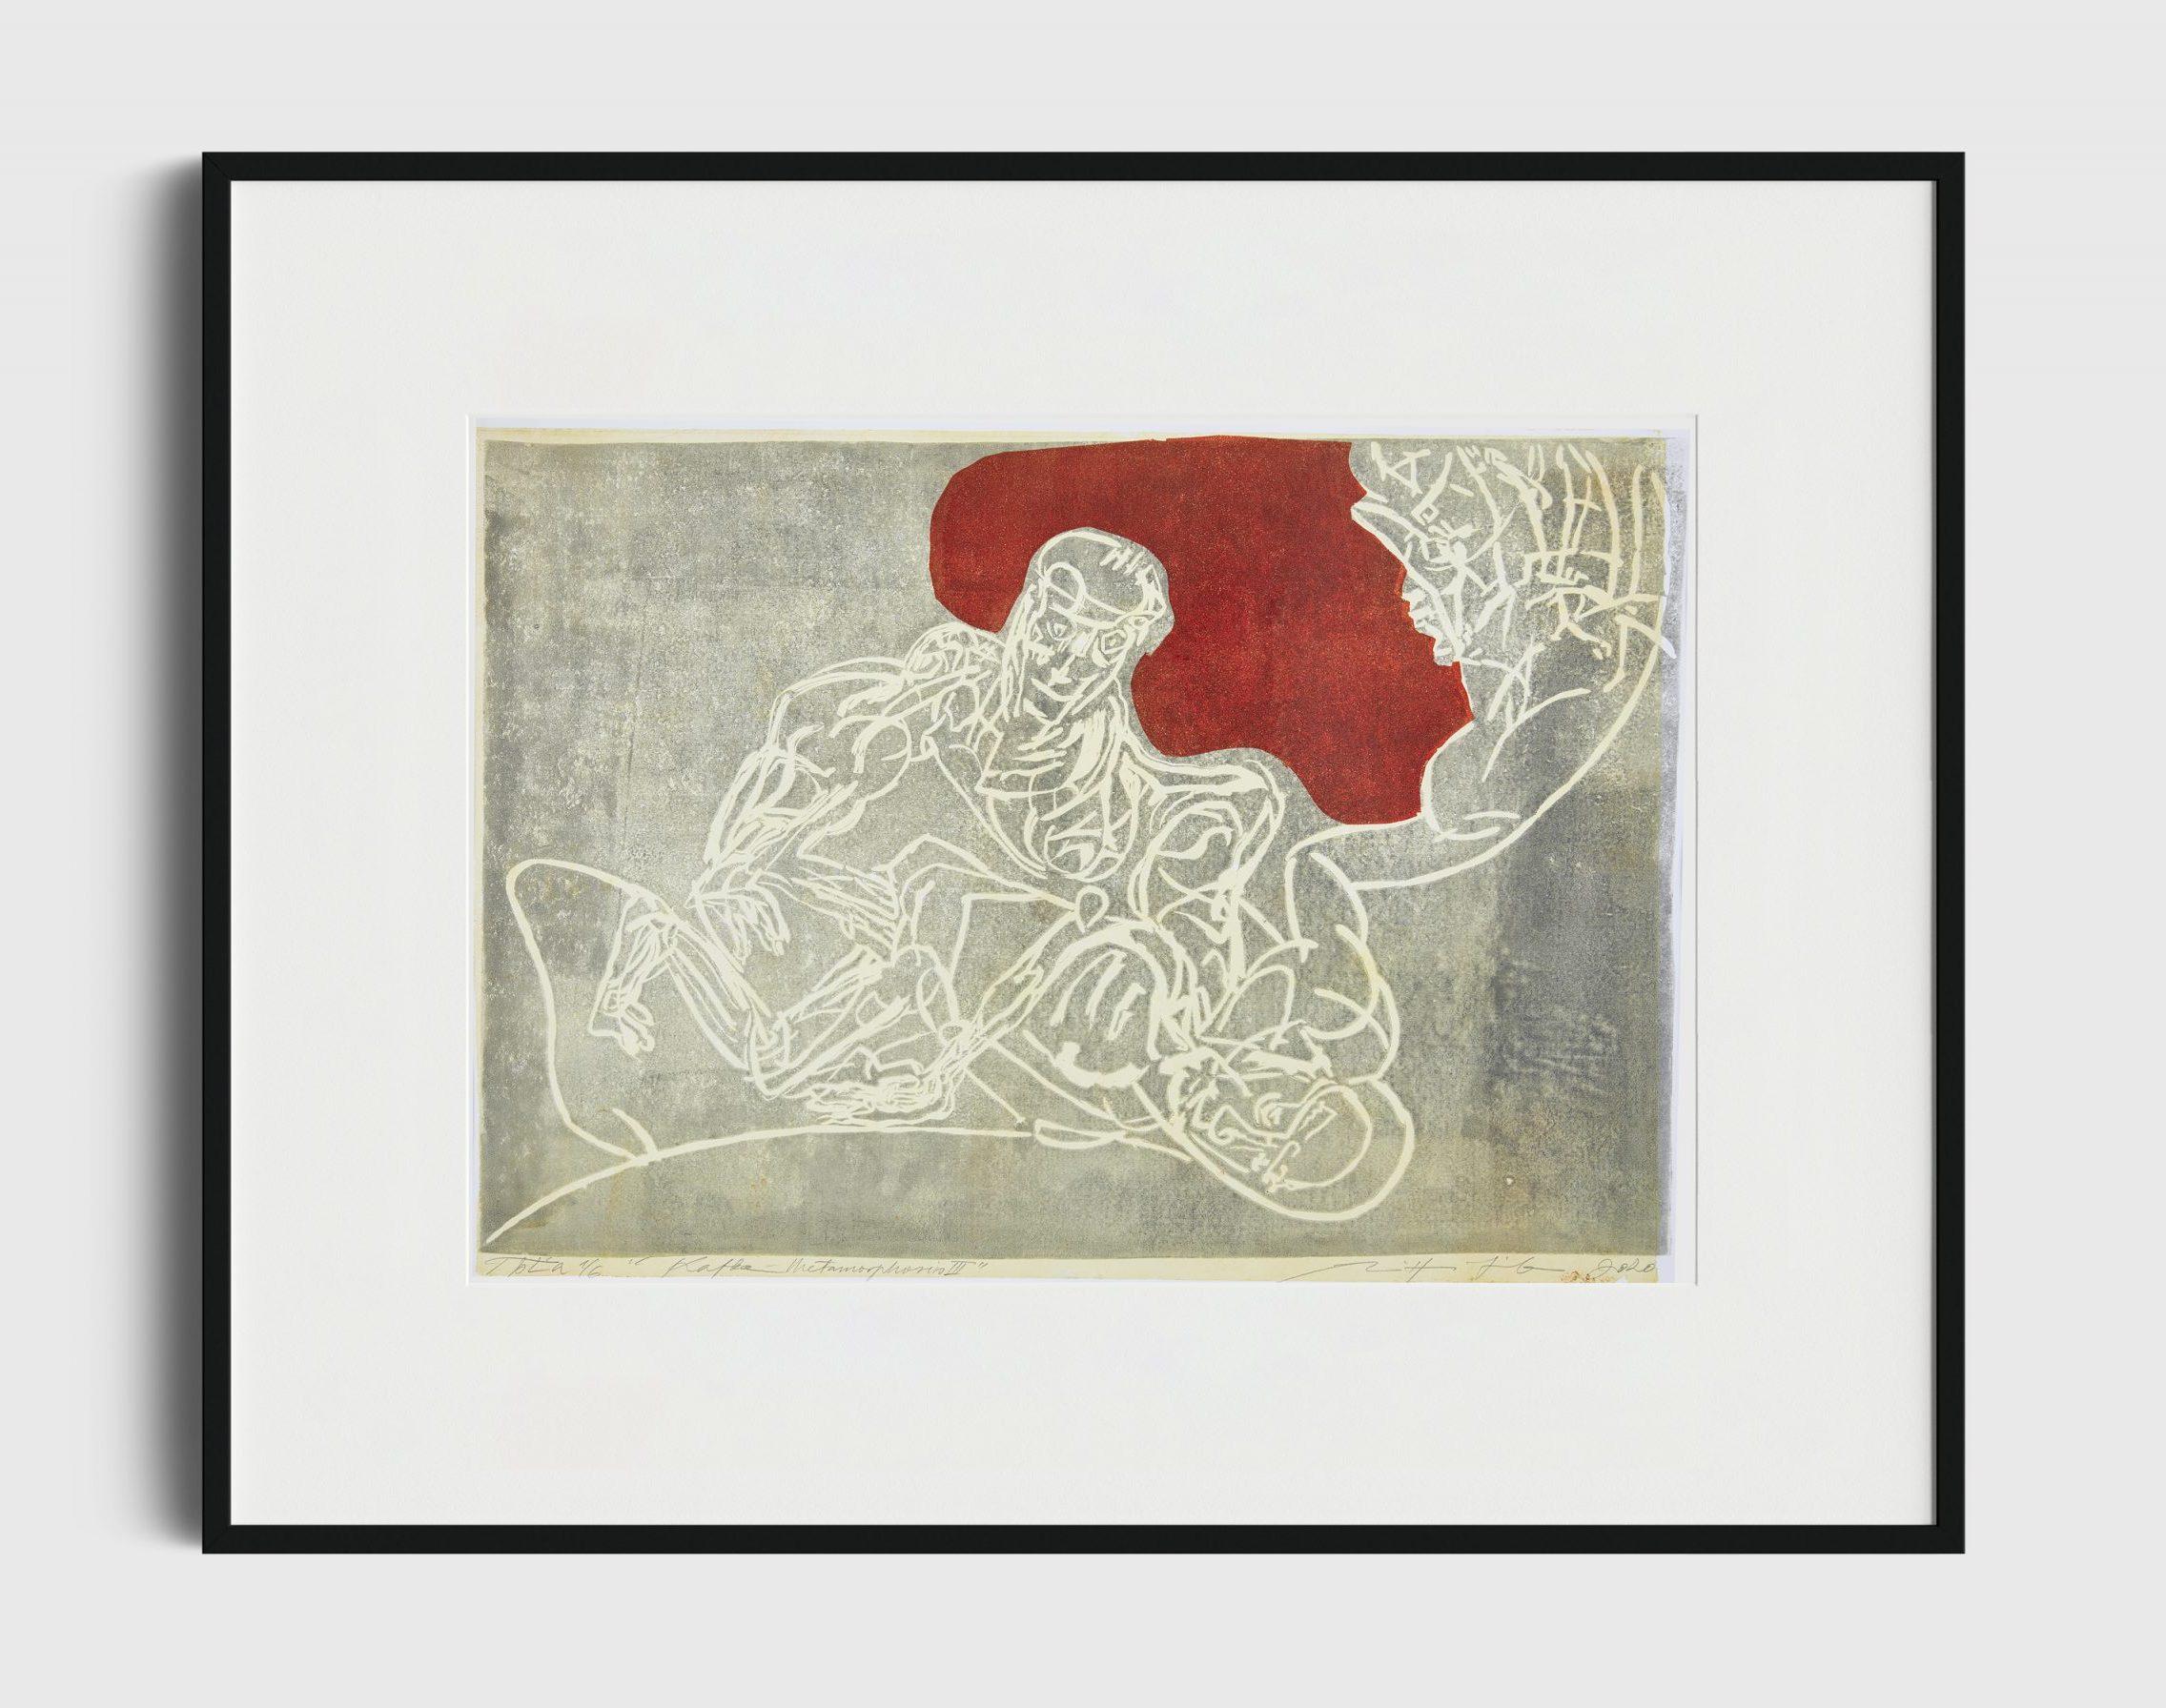 """Kafka, Metamorphosis III"" 1/6, linoprint, 50x70 cm, 2020"